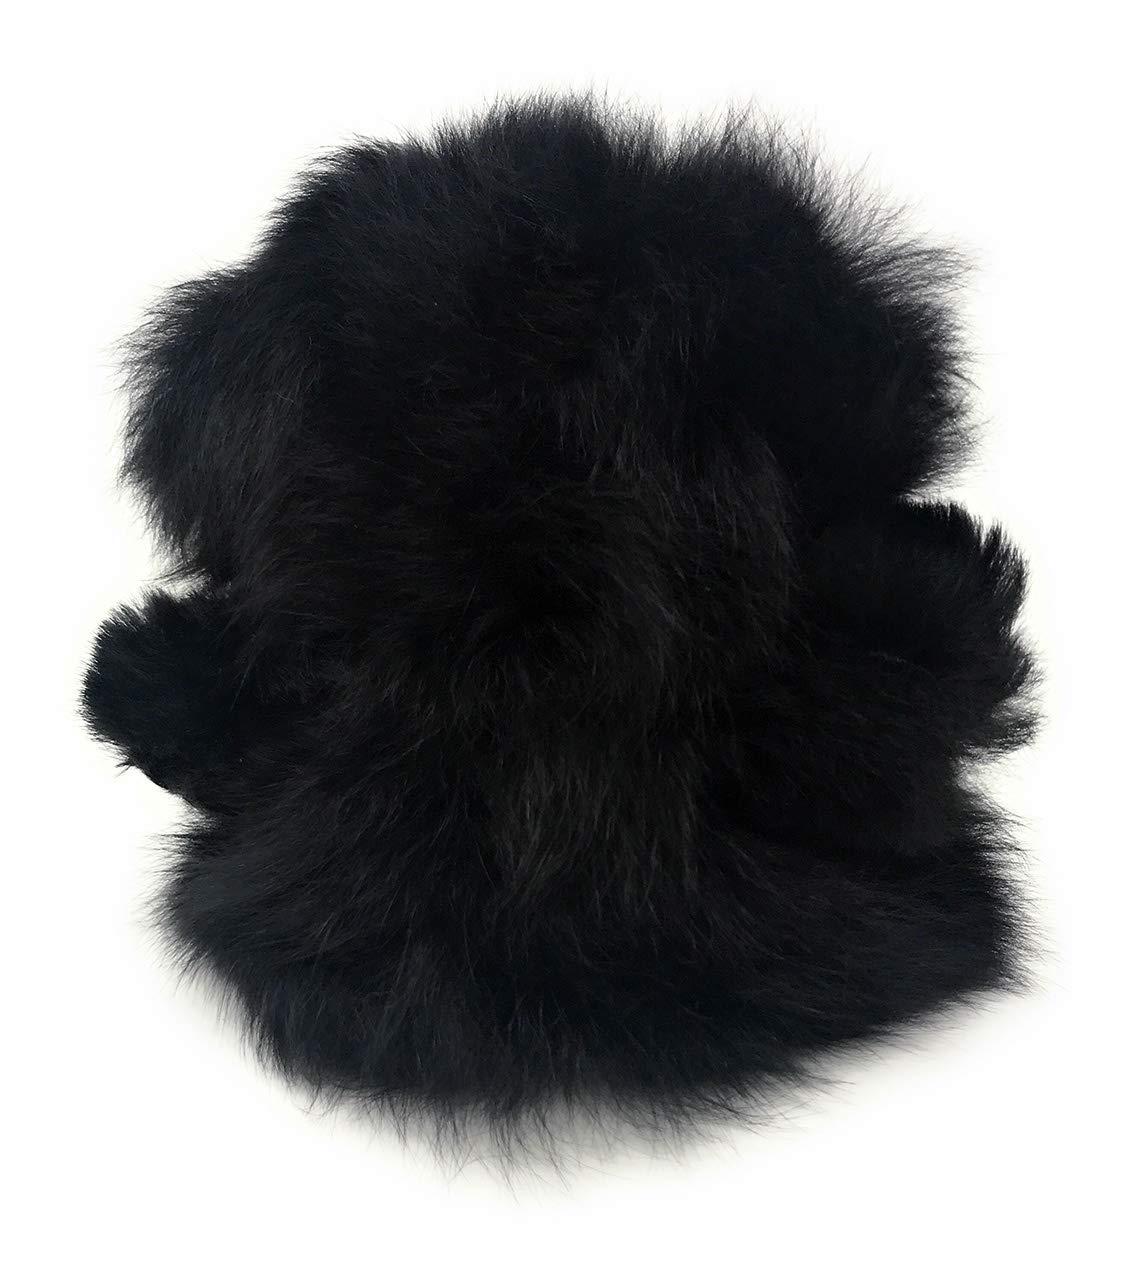 Inch Black Coal Baby Alpaca Fur Sitting Chubby Bear Hand Made 5 Each Bear is Unique Inca Fashions